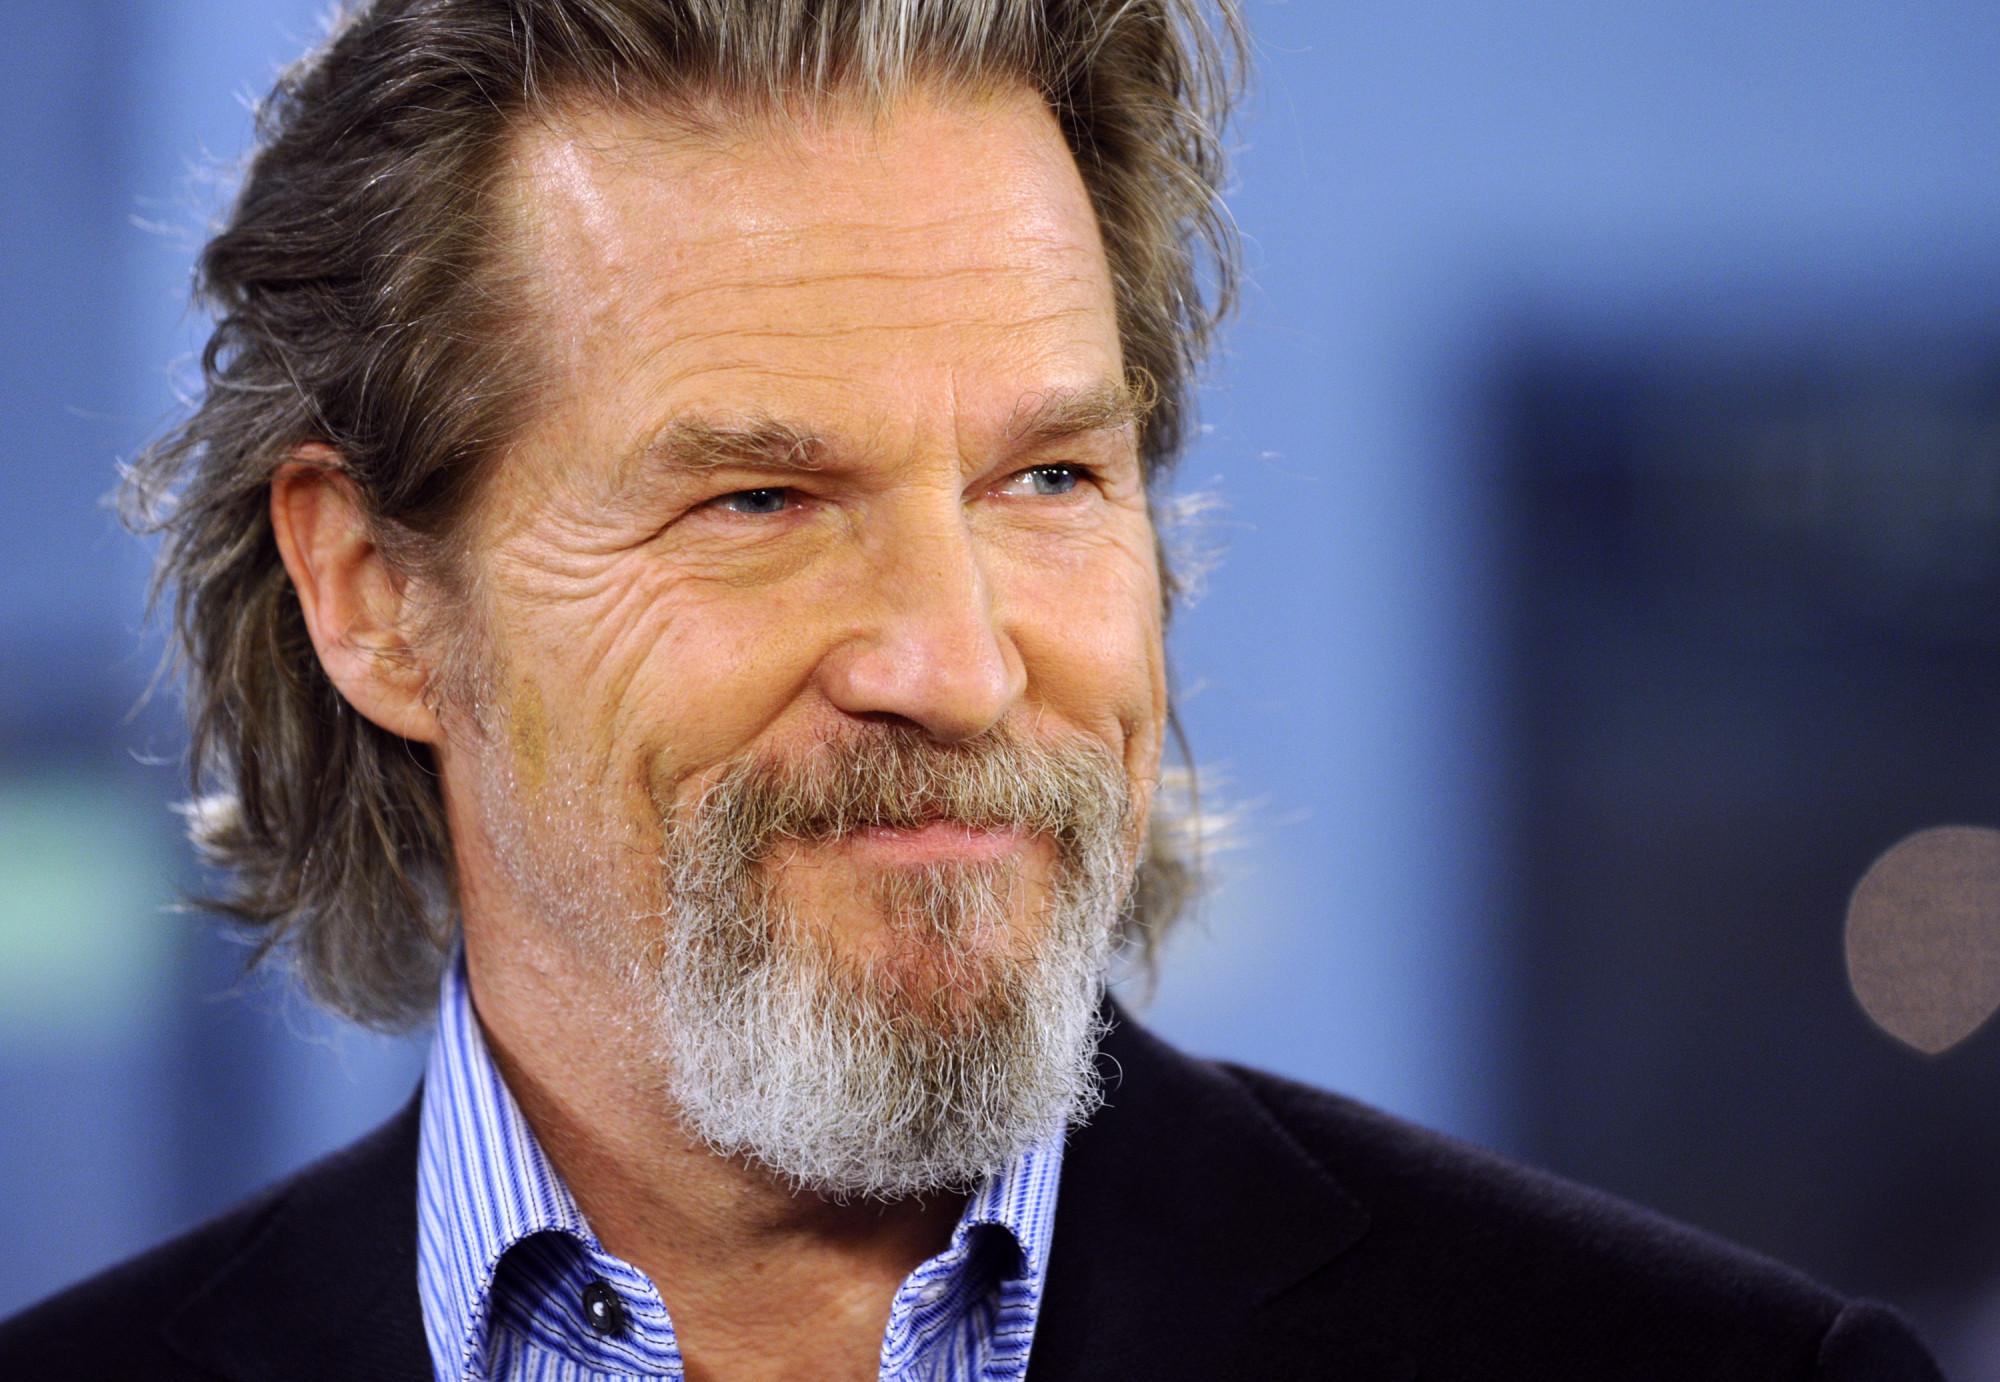 Jeff Bridges Marriage Advice Actor Talks Infidelity